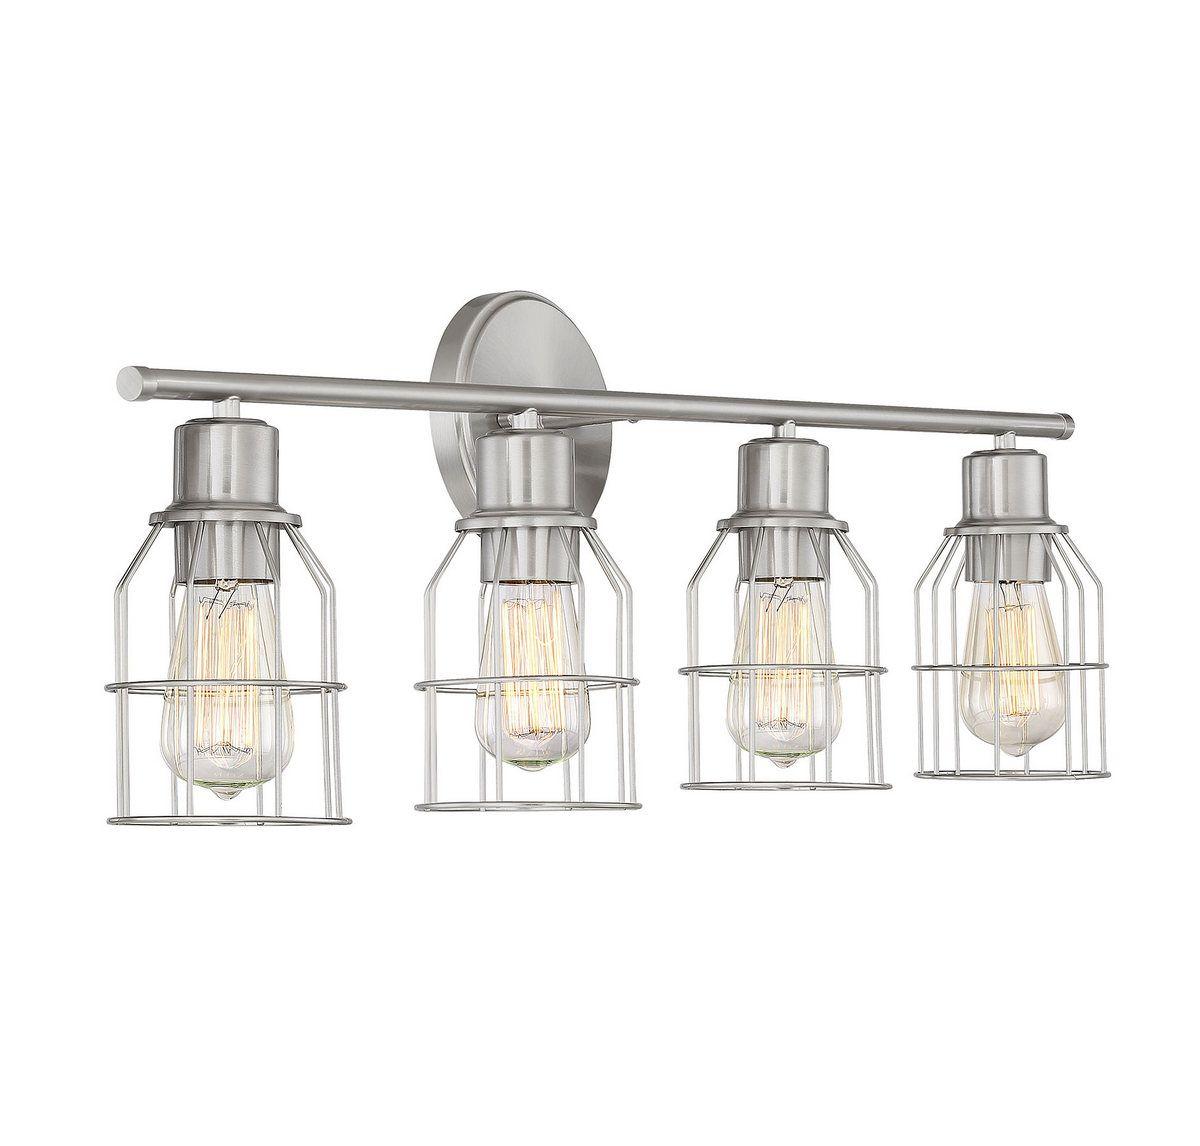 Trade Winds Lighting Industrial Wire 4-Light Bathroom ...